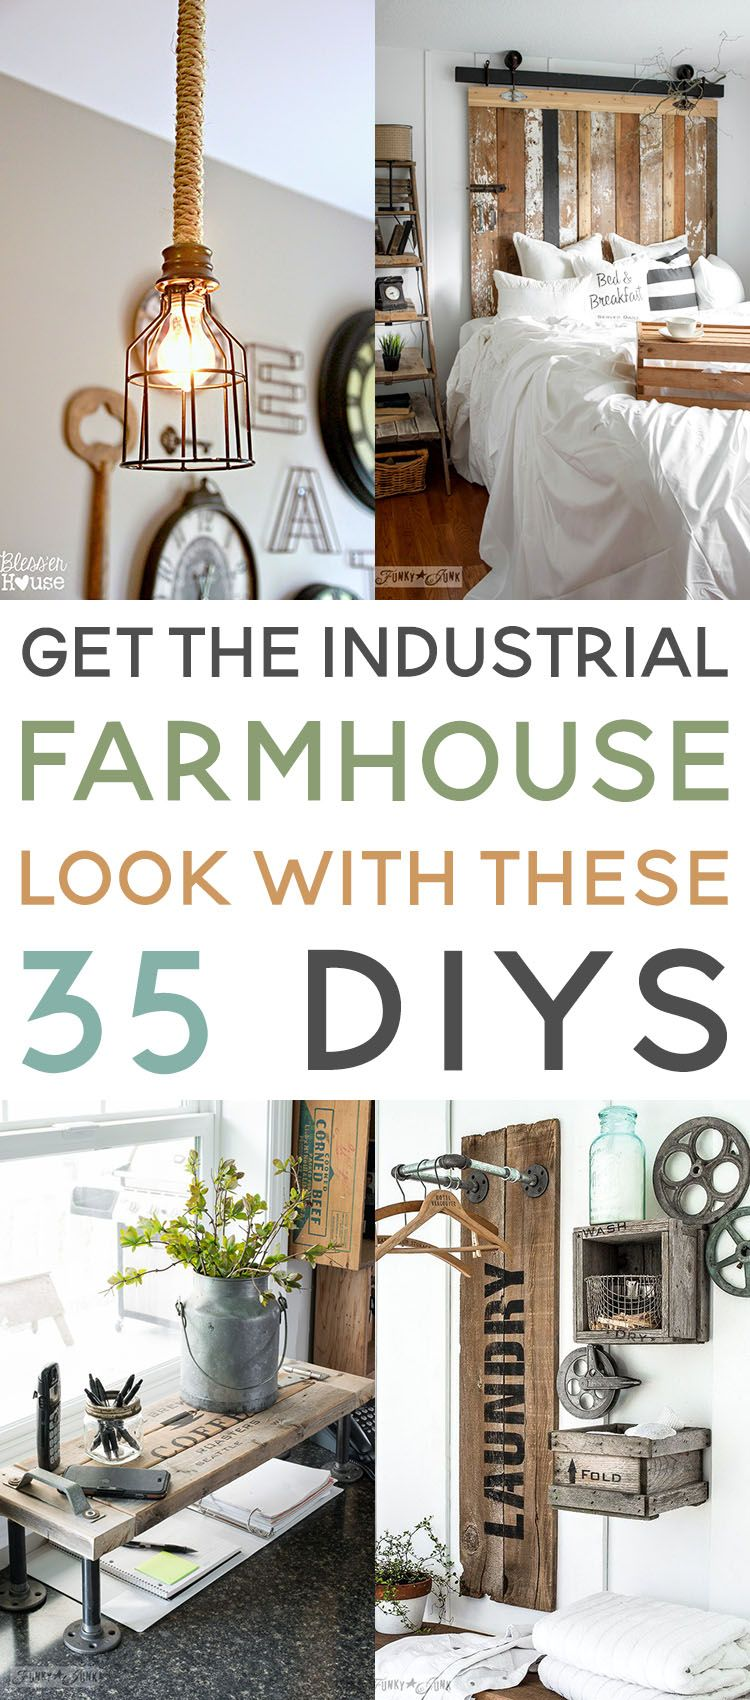 Amazing Budget Friendly Industrial Farmhouse DIYS - The Cottage Market